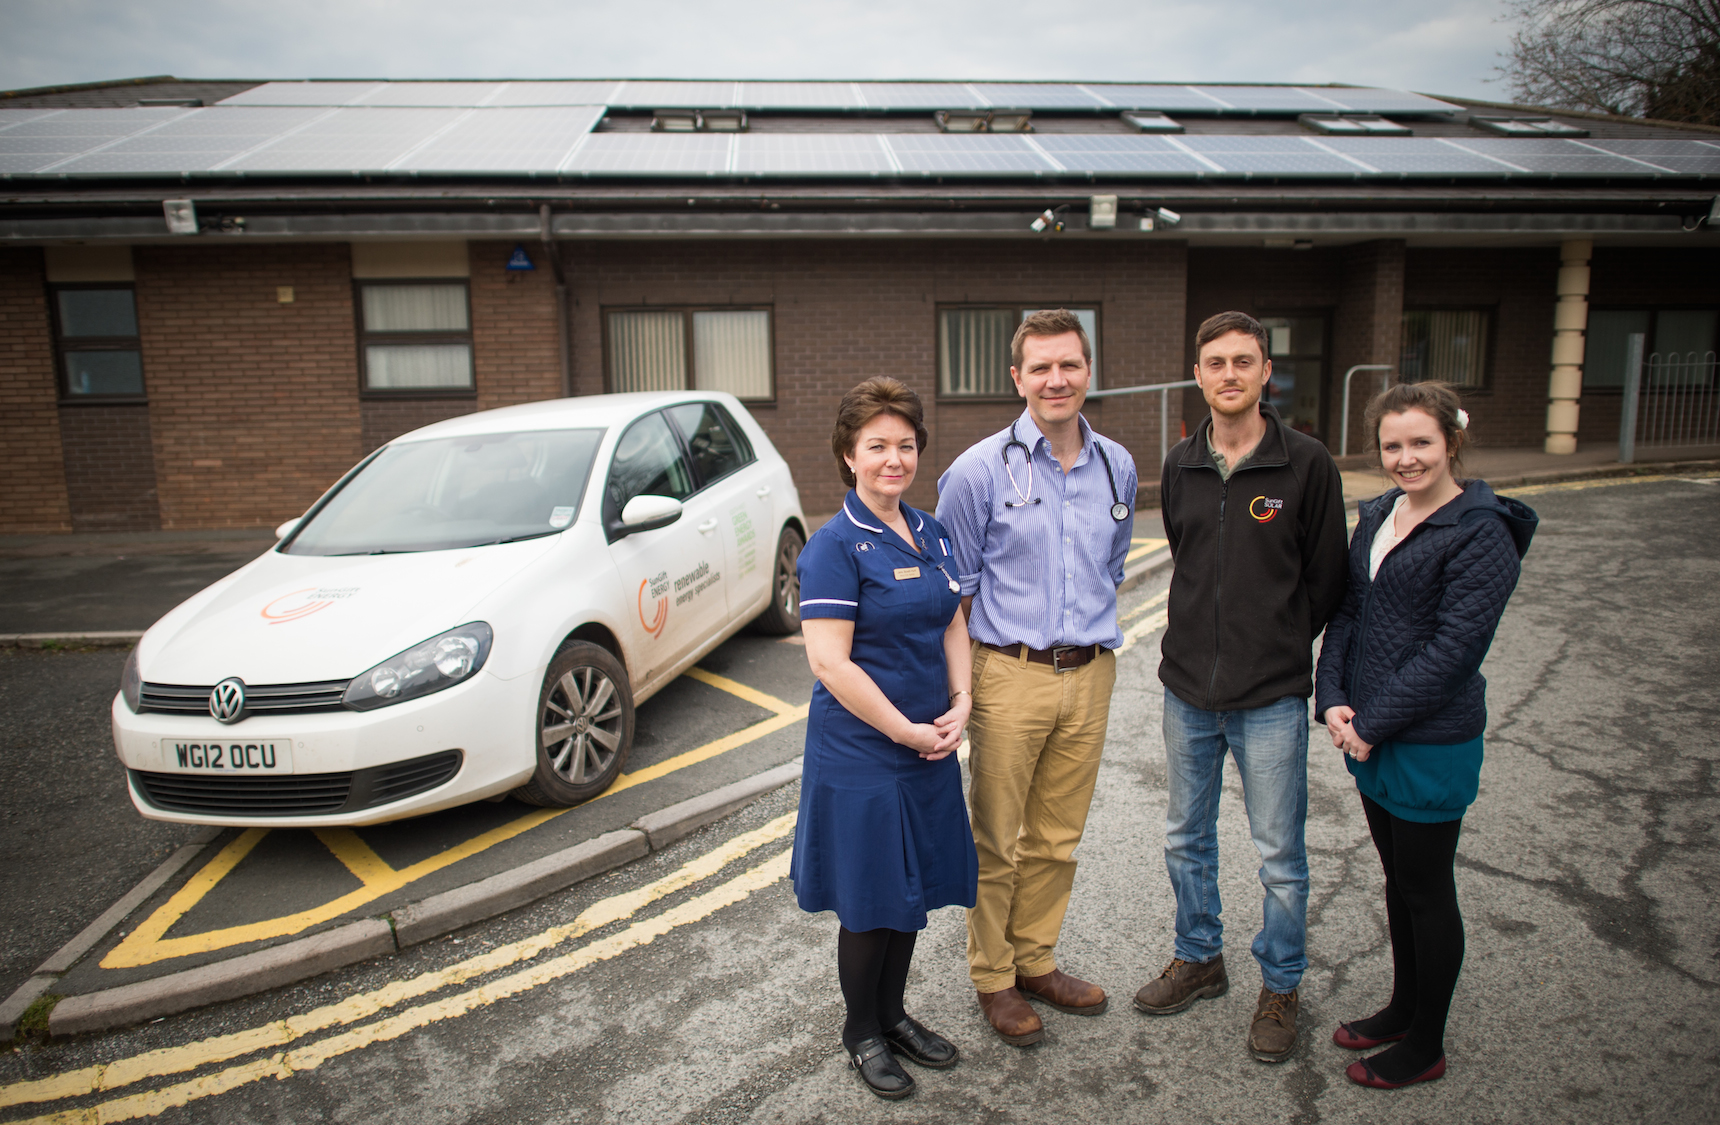 Exeter Gps Health Centre Prescribes Solar The Exeter Daily